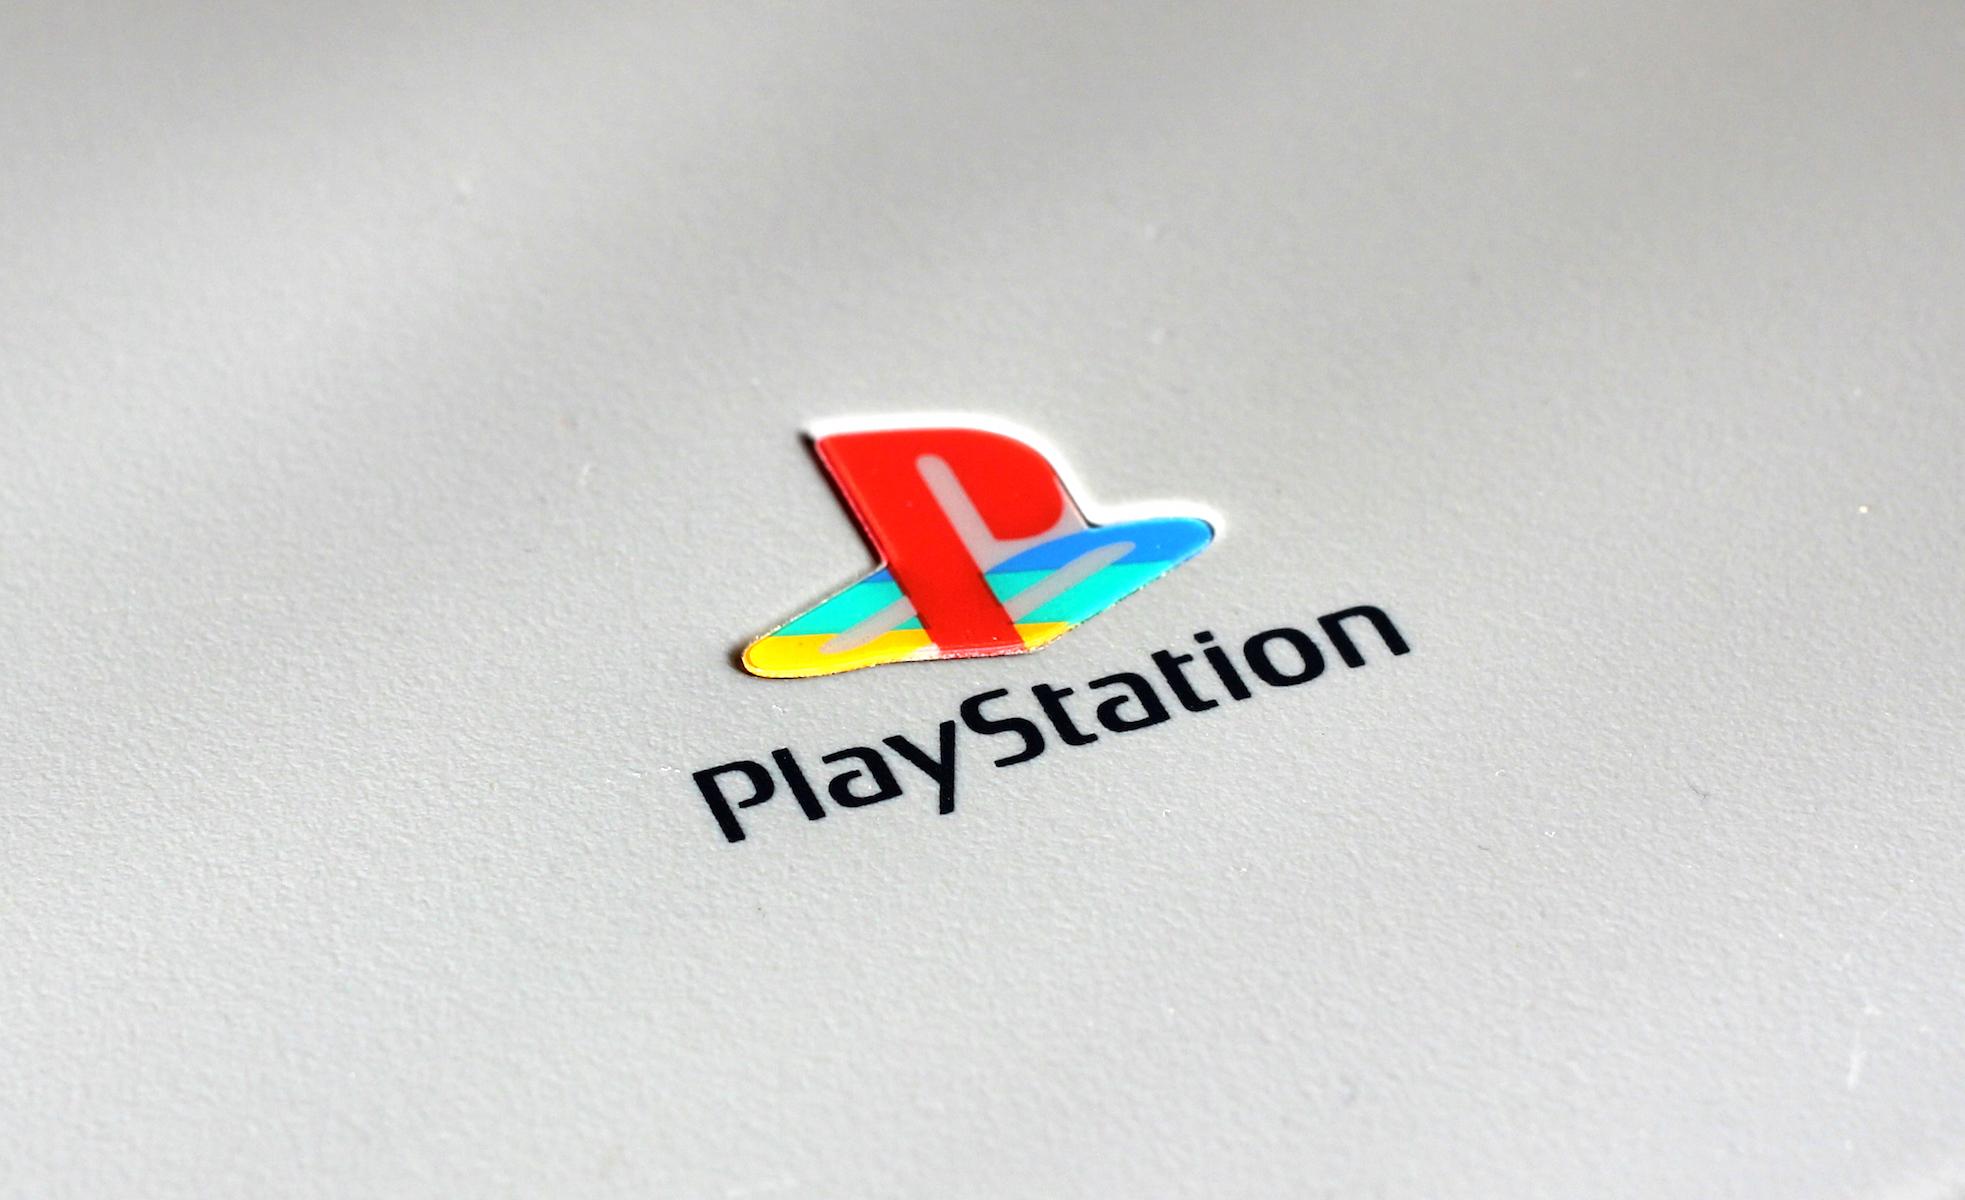 A photo of the original PlayStation logo